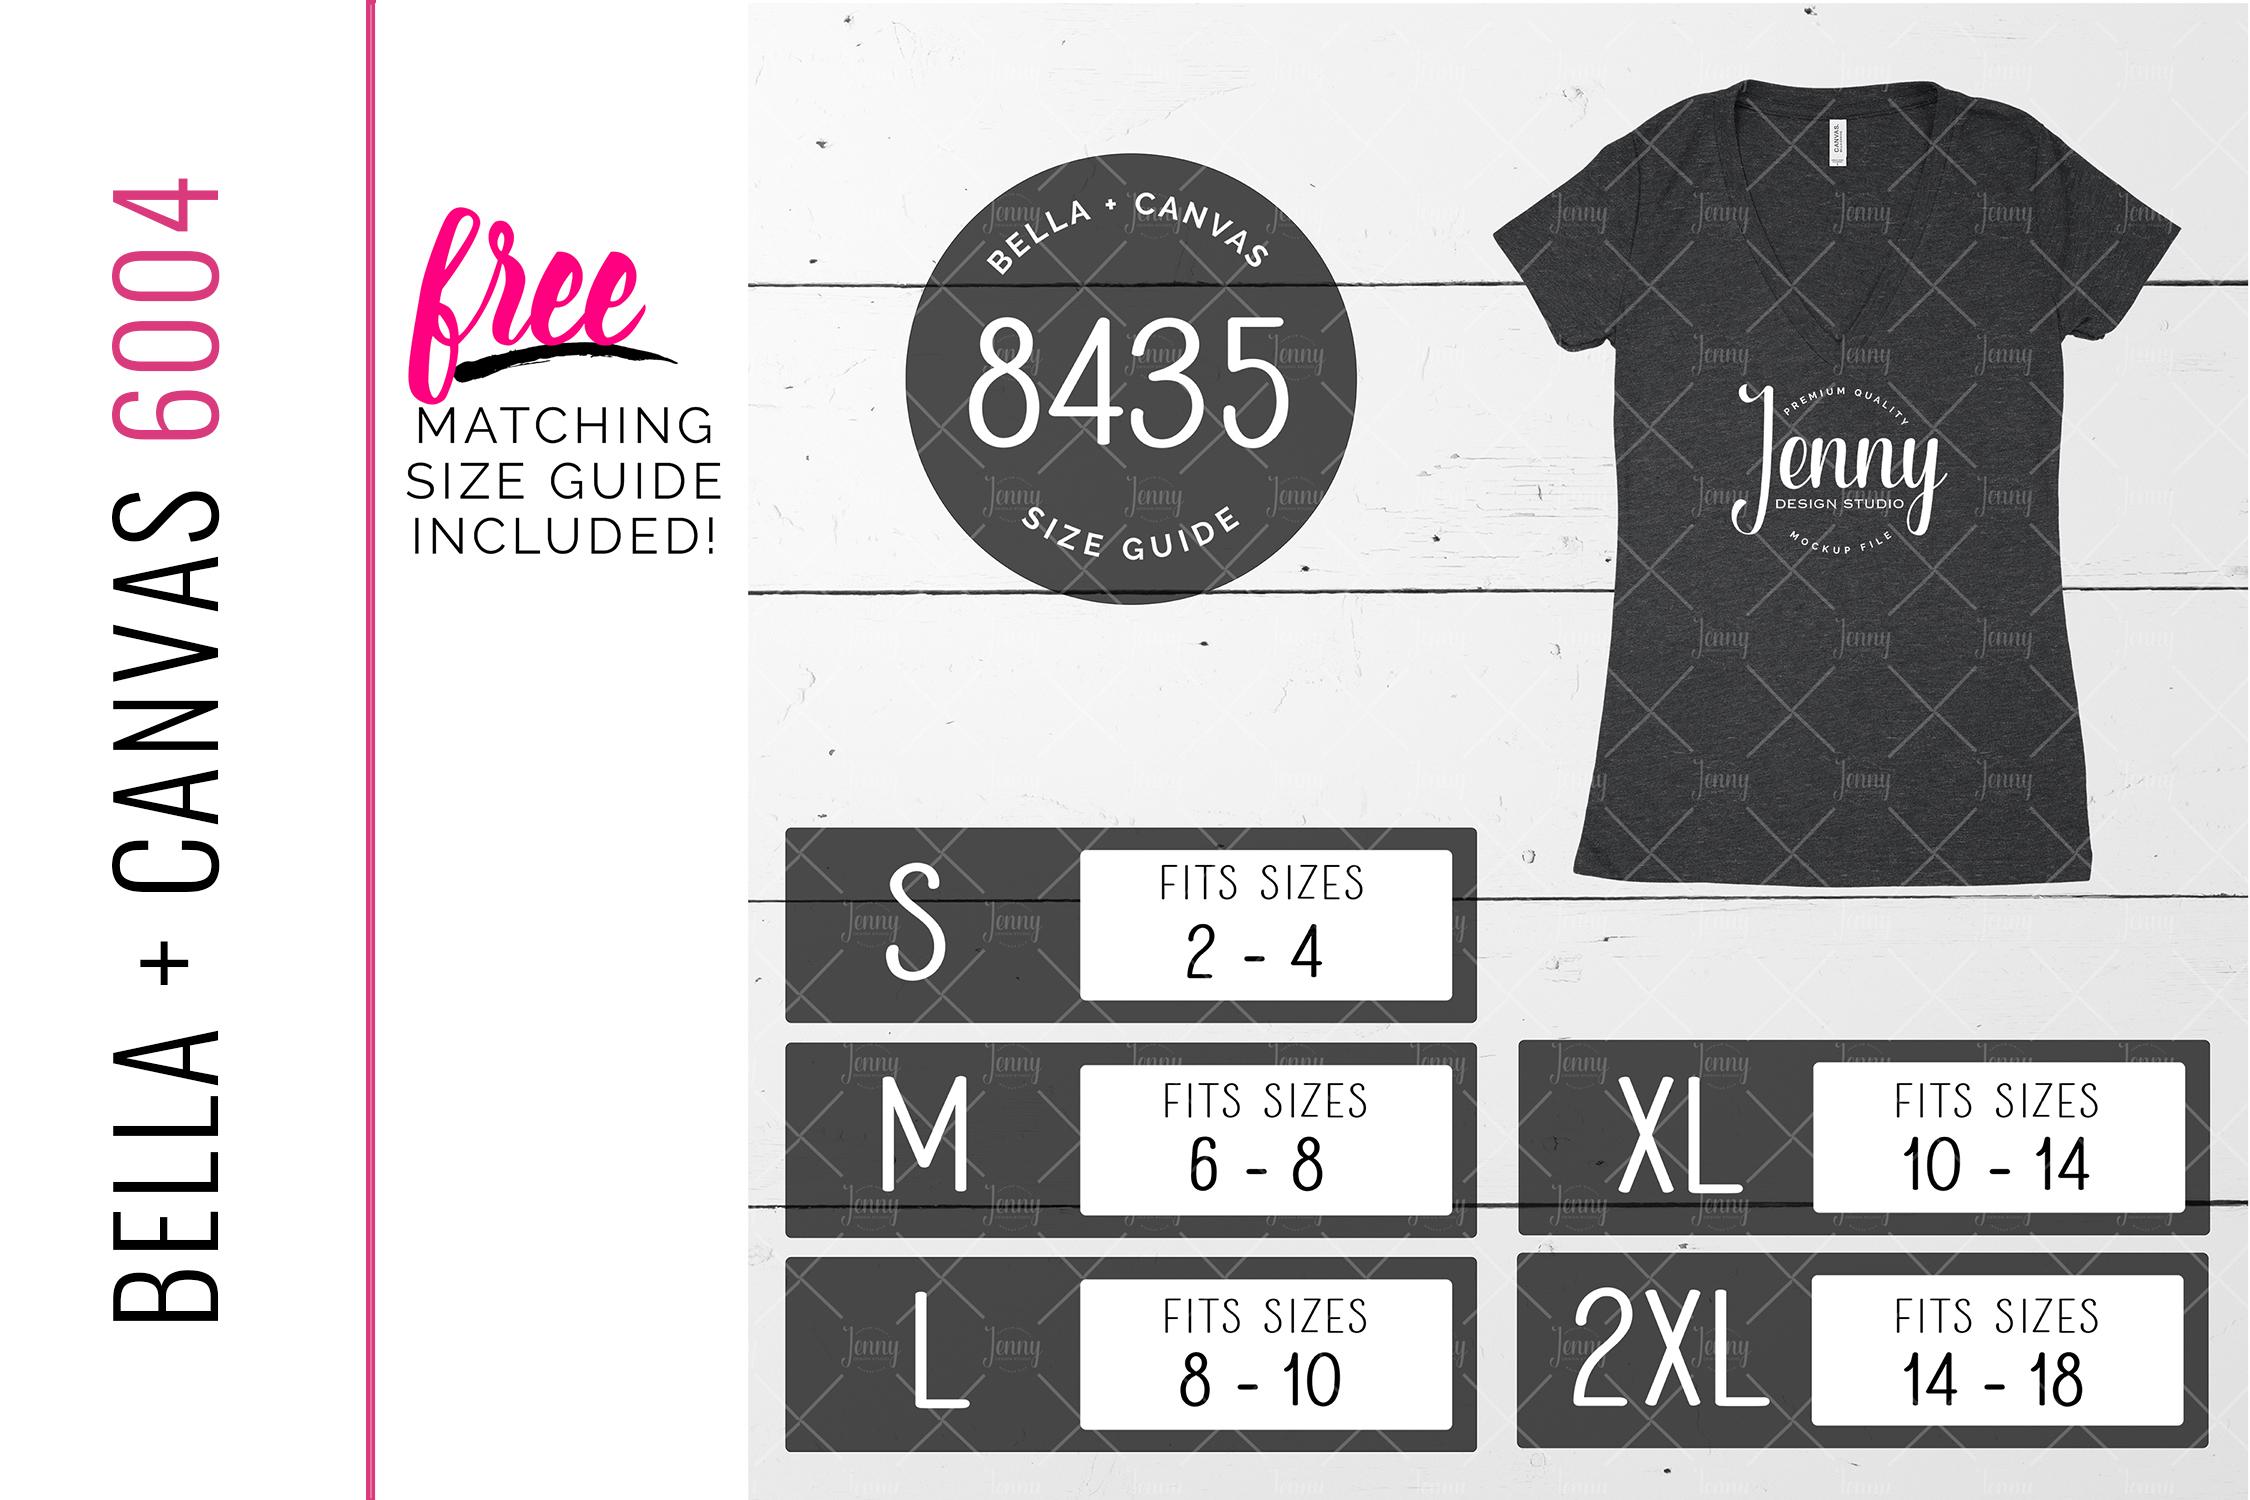 Bella Canvas 8435 Unisex Mockup Bundle, Womens T-Shirt example image 2